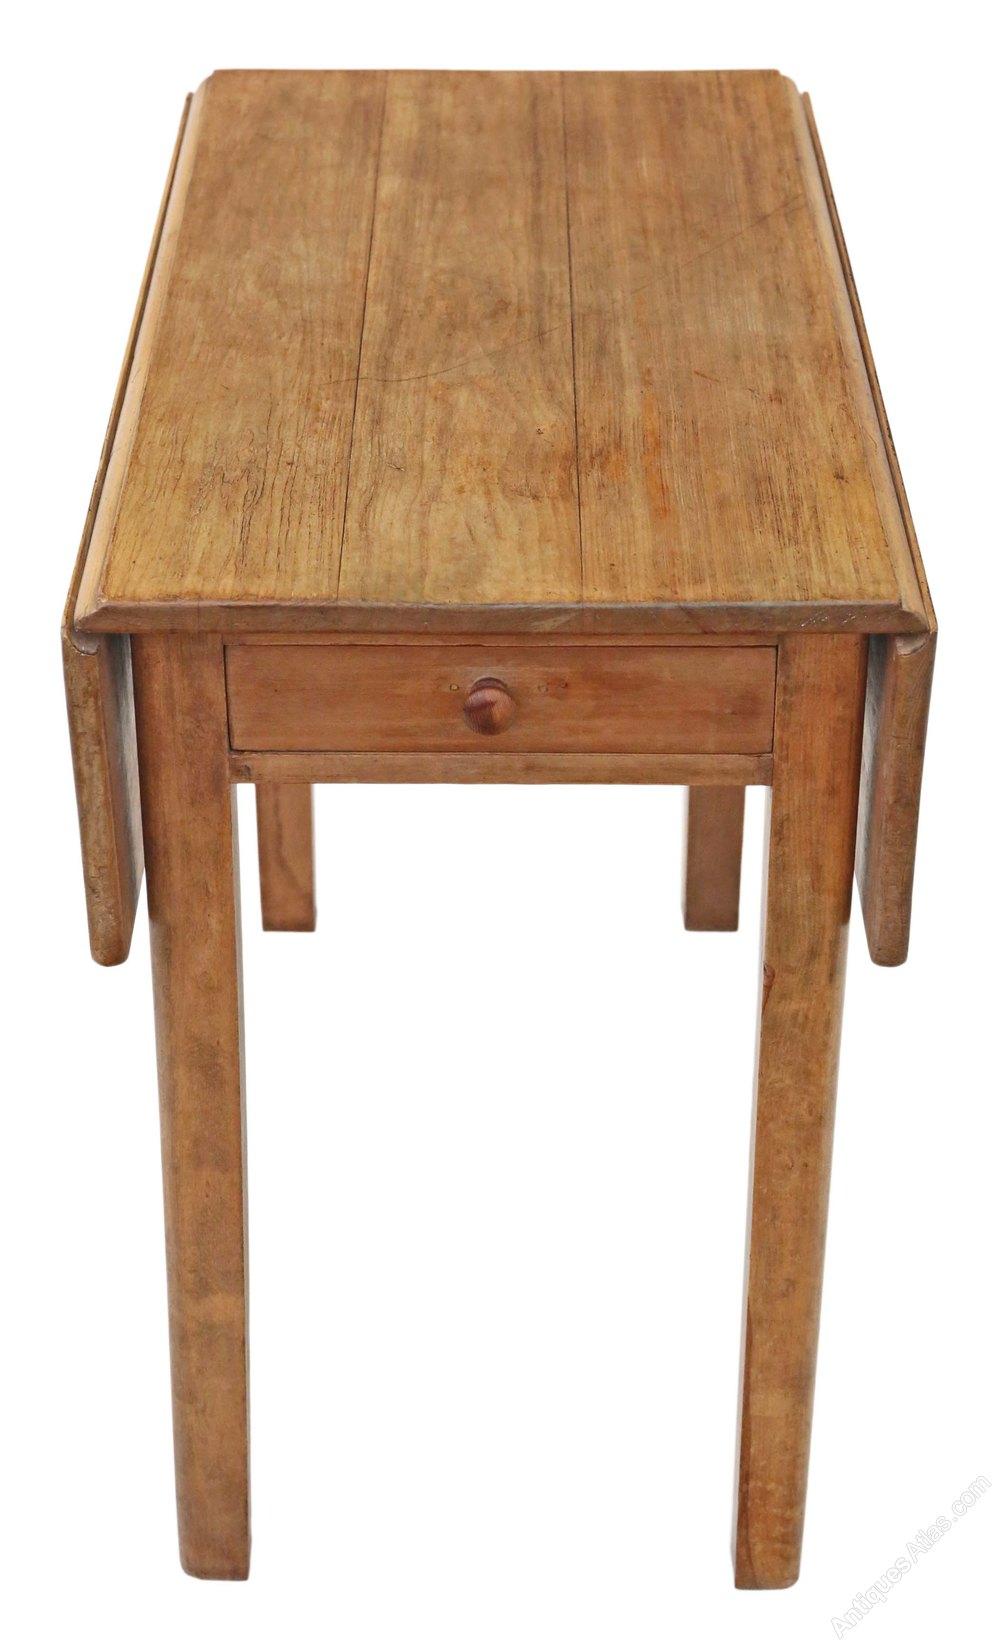 Drop leaf scrub top pine kitchen dining table antiques atlas for Antique drop leaf dining table